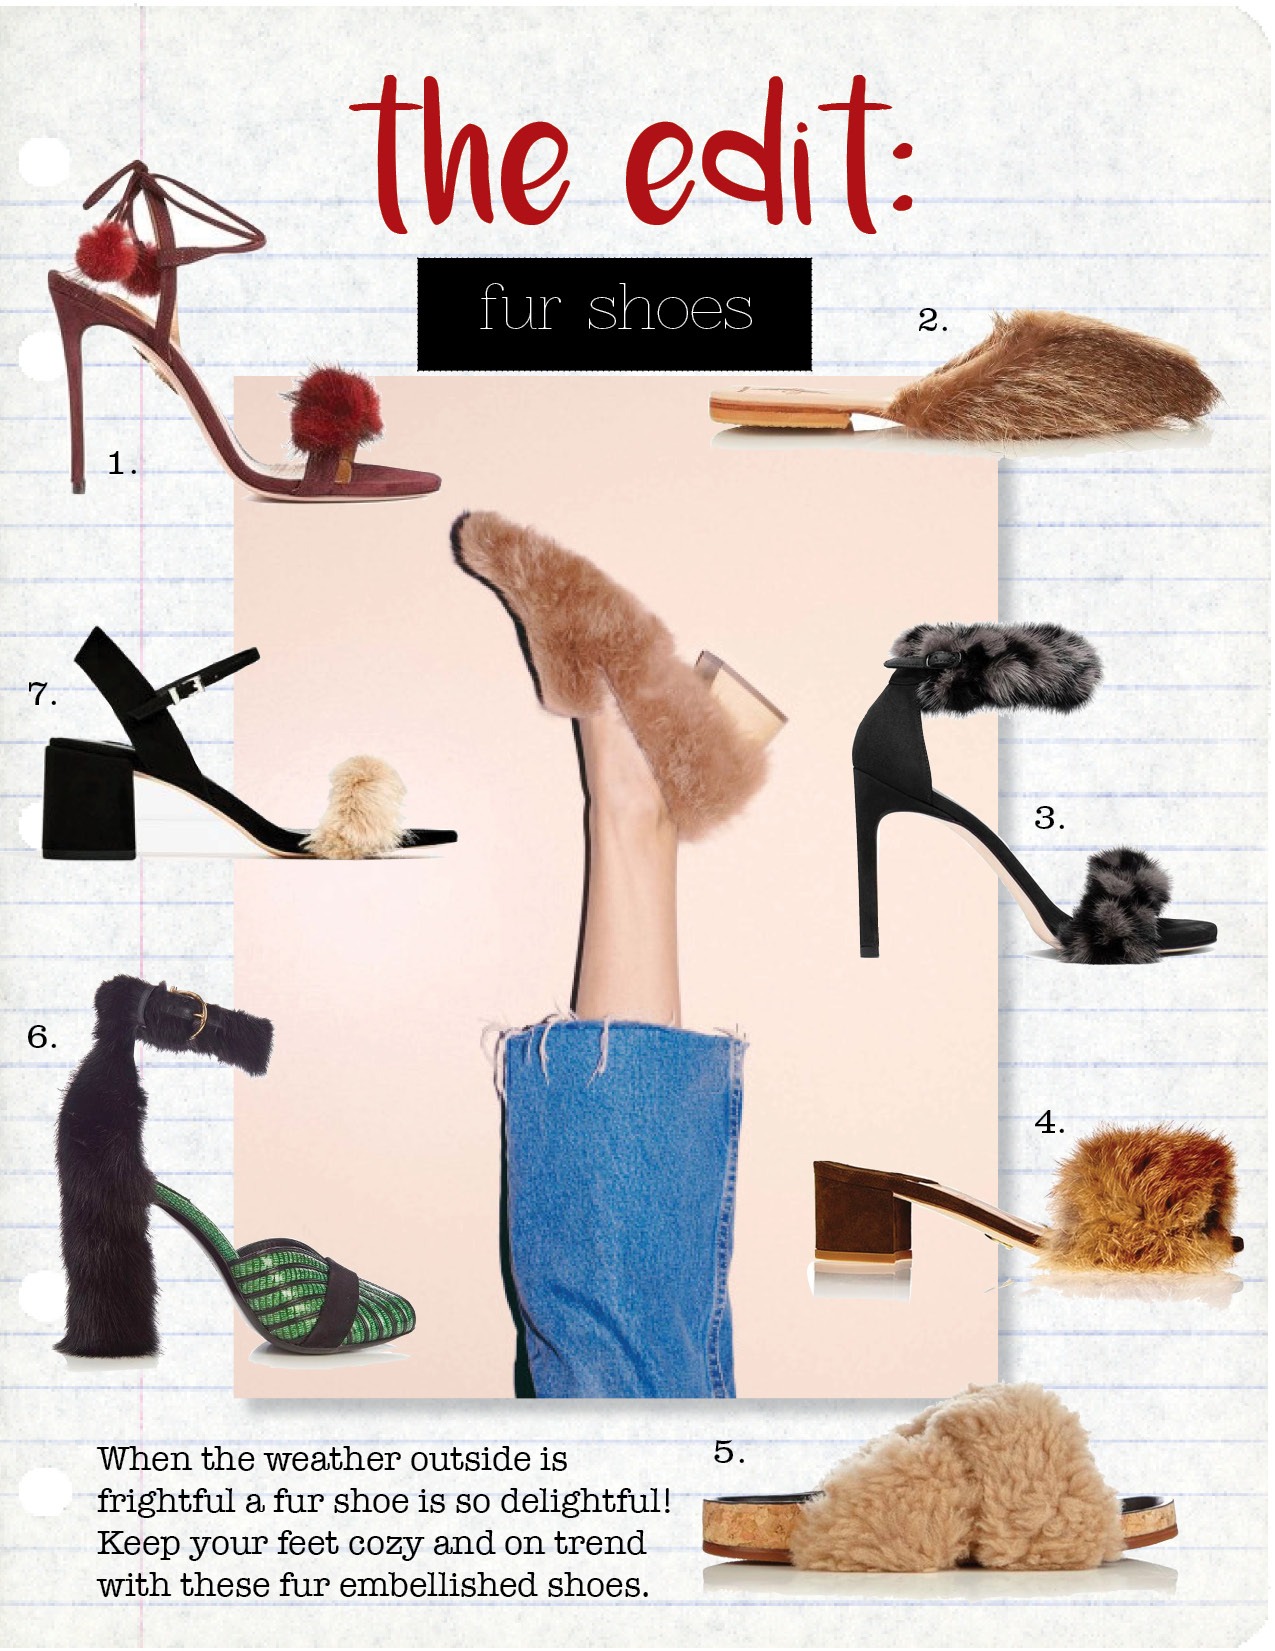 1. Aquazzura Wild russian sandals, $447,  farfetch.com  2. brother vellies majorelle babouche shoes, $210,  matchesfashion.com  3. stuart Weitzman no bunny hop fur sandals, $498,  shopbop.com  4. brother vellies tufted solt sandal, $745,  brothervellies.com  5. chloe kerenn shearling flat sandals, $518,  matchesfashion.com  6. salvatore ferragamo fata reptile-effect leather sandals, $1049,  matchesfashion.com  7. zara faux fur vamp sandals, $59,  zara.com